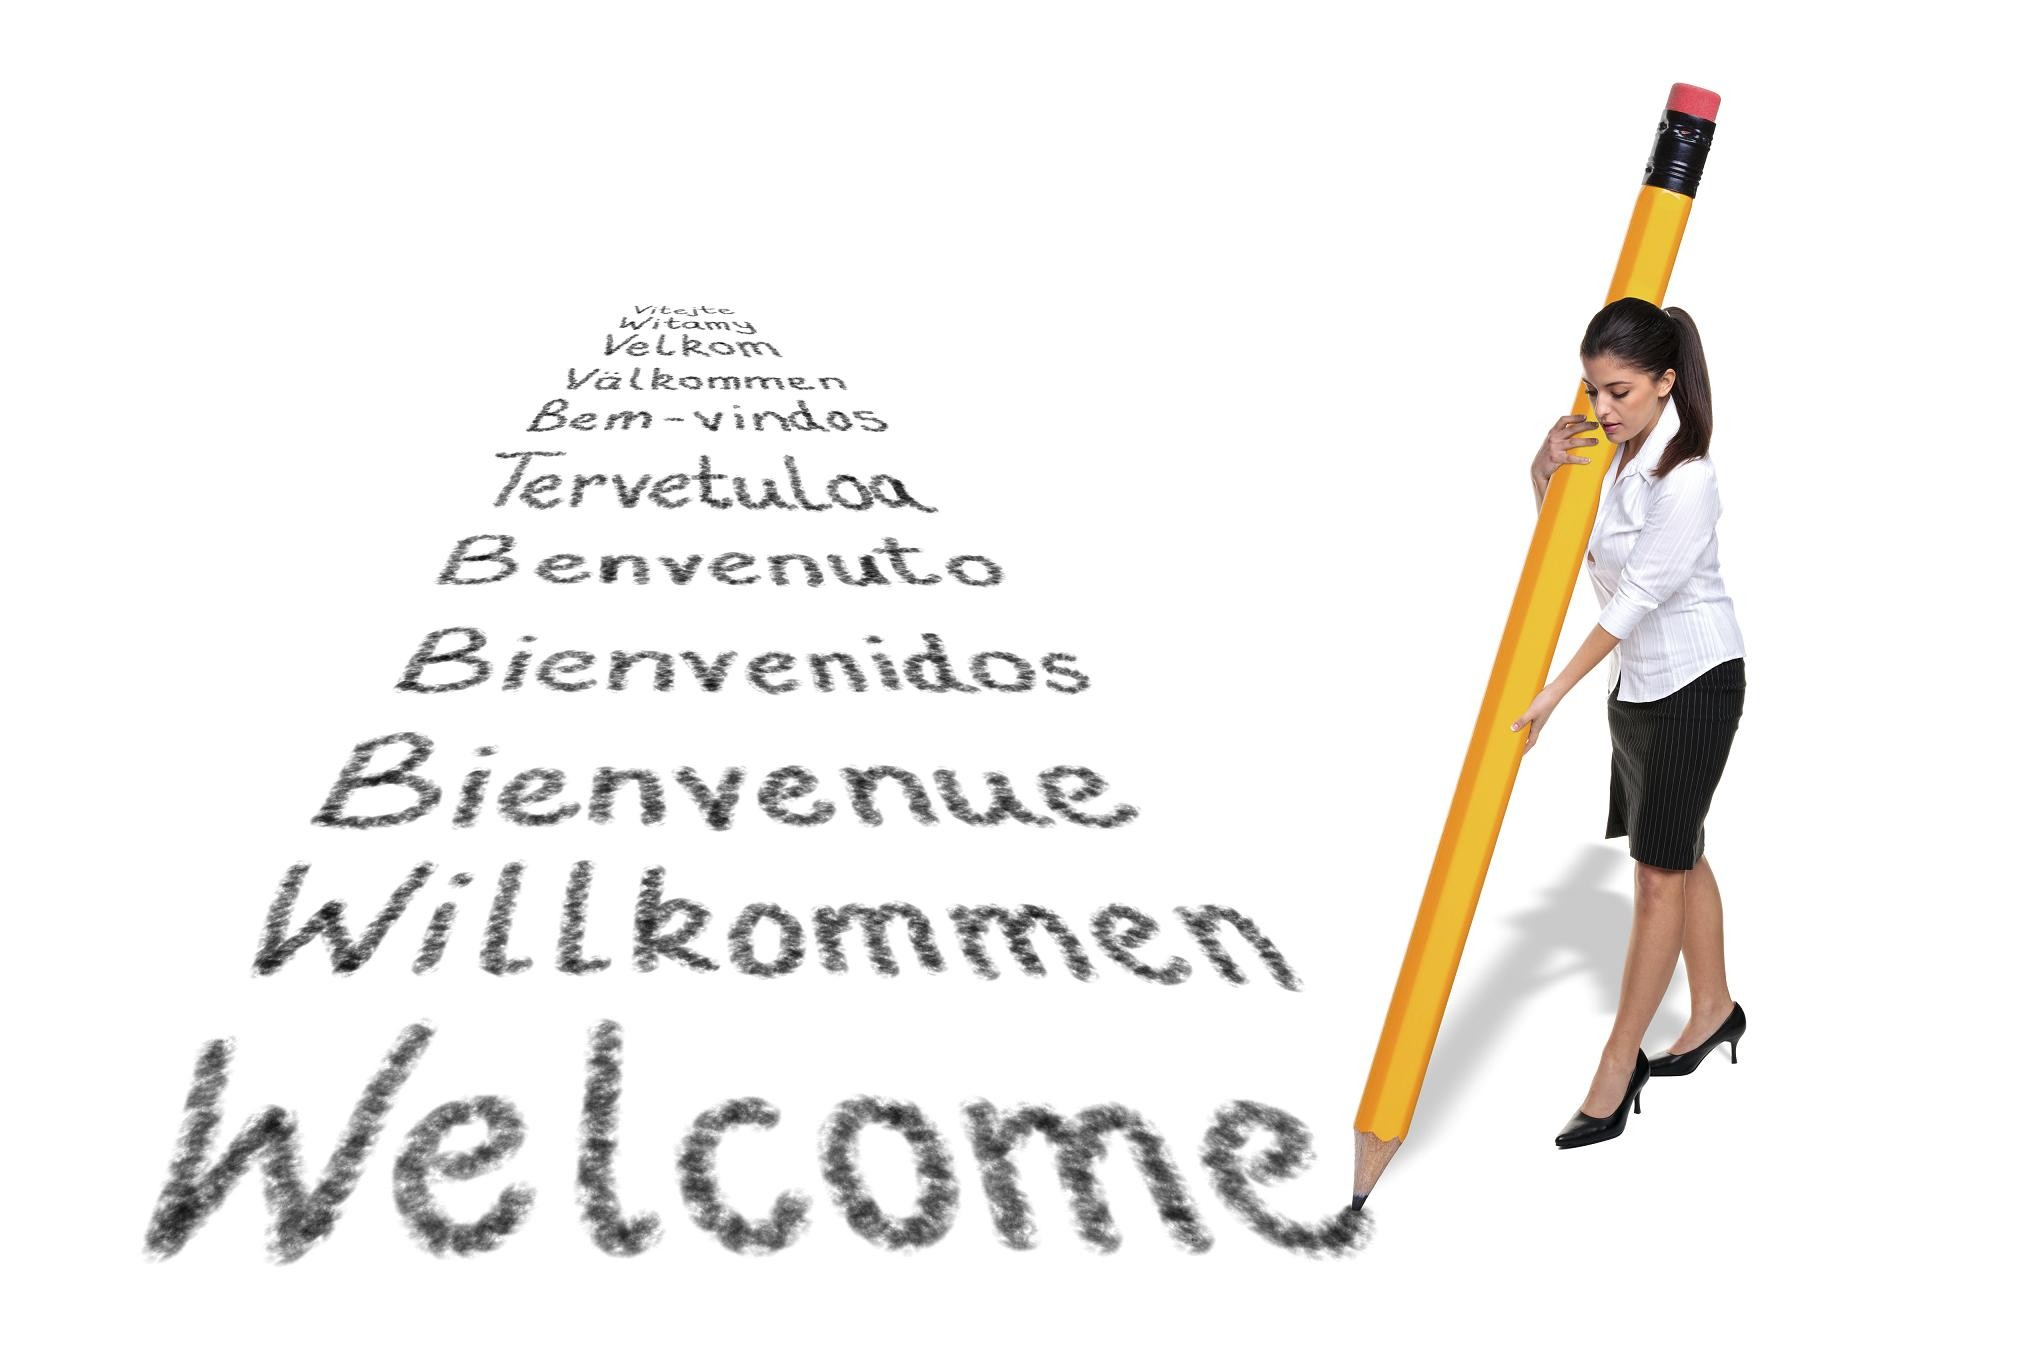 Business plan disclaimer language